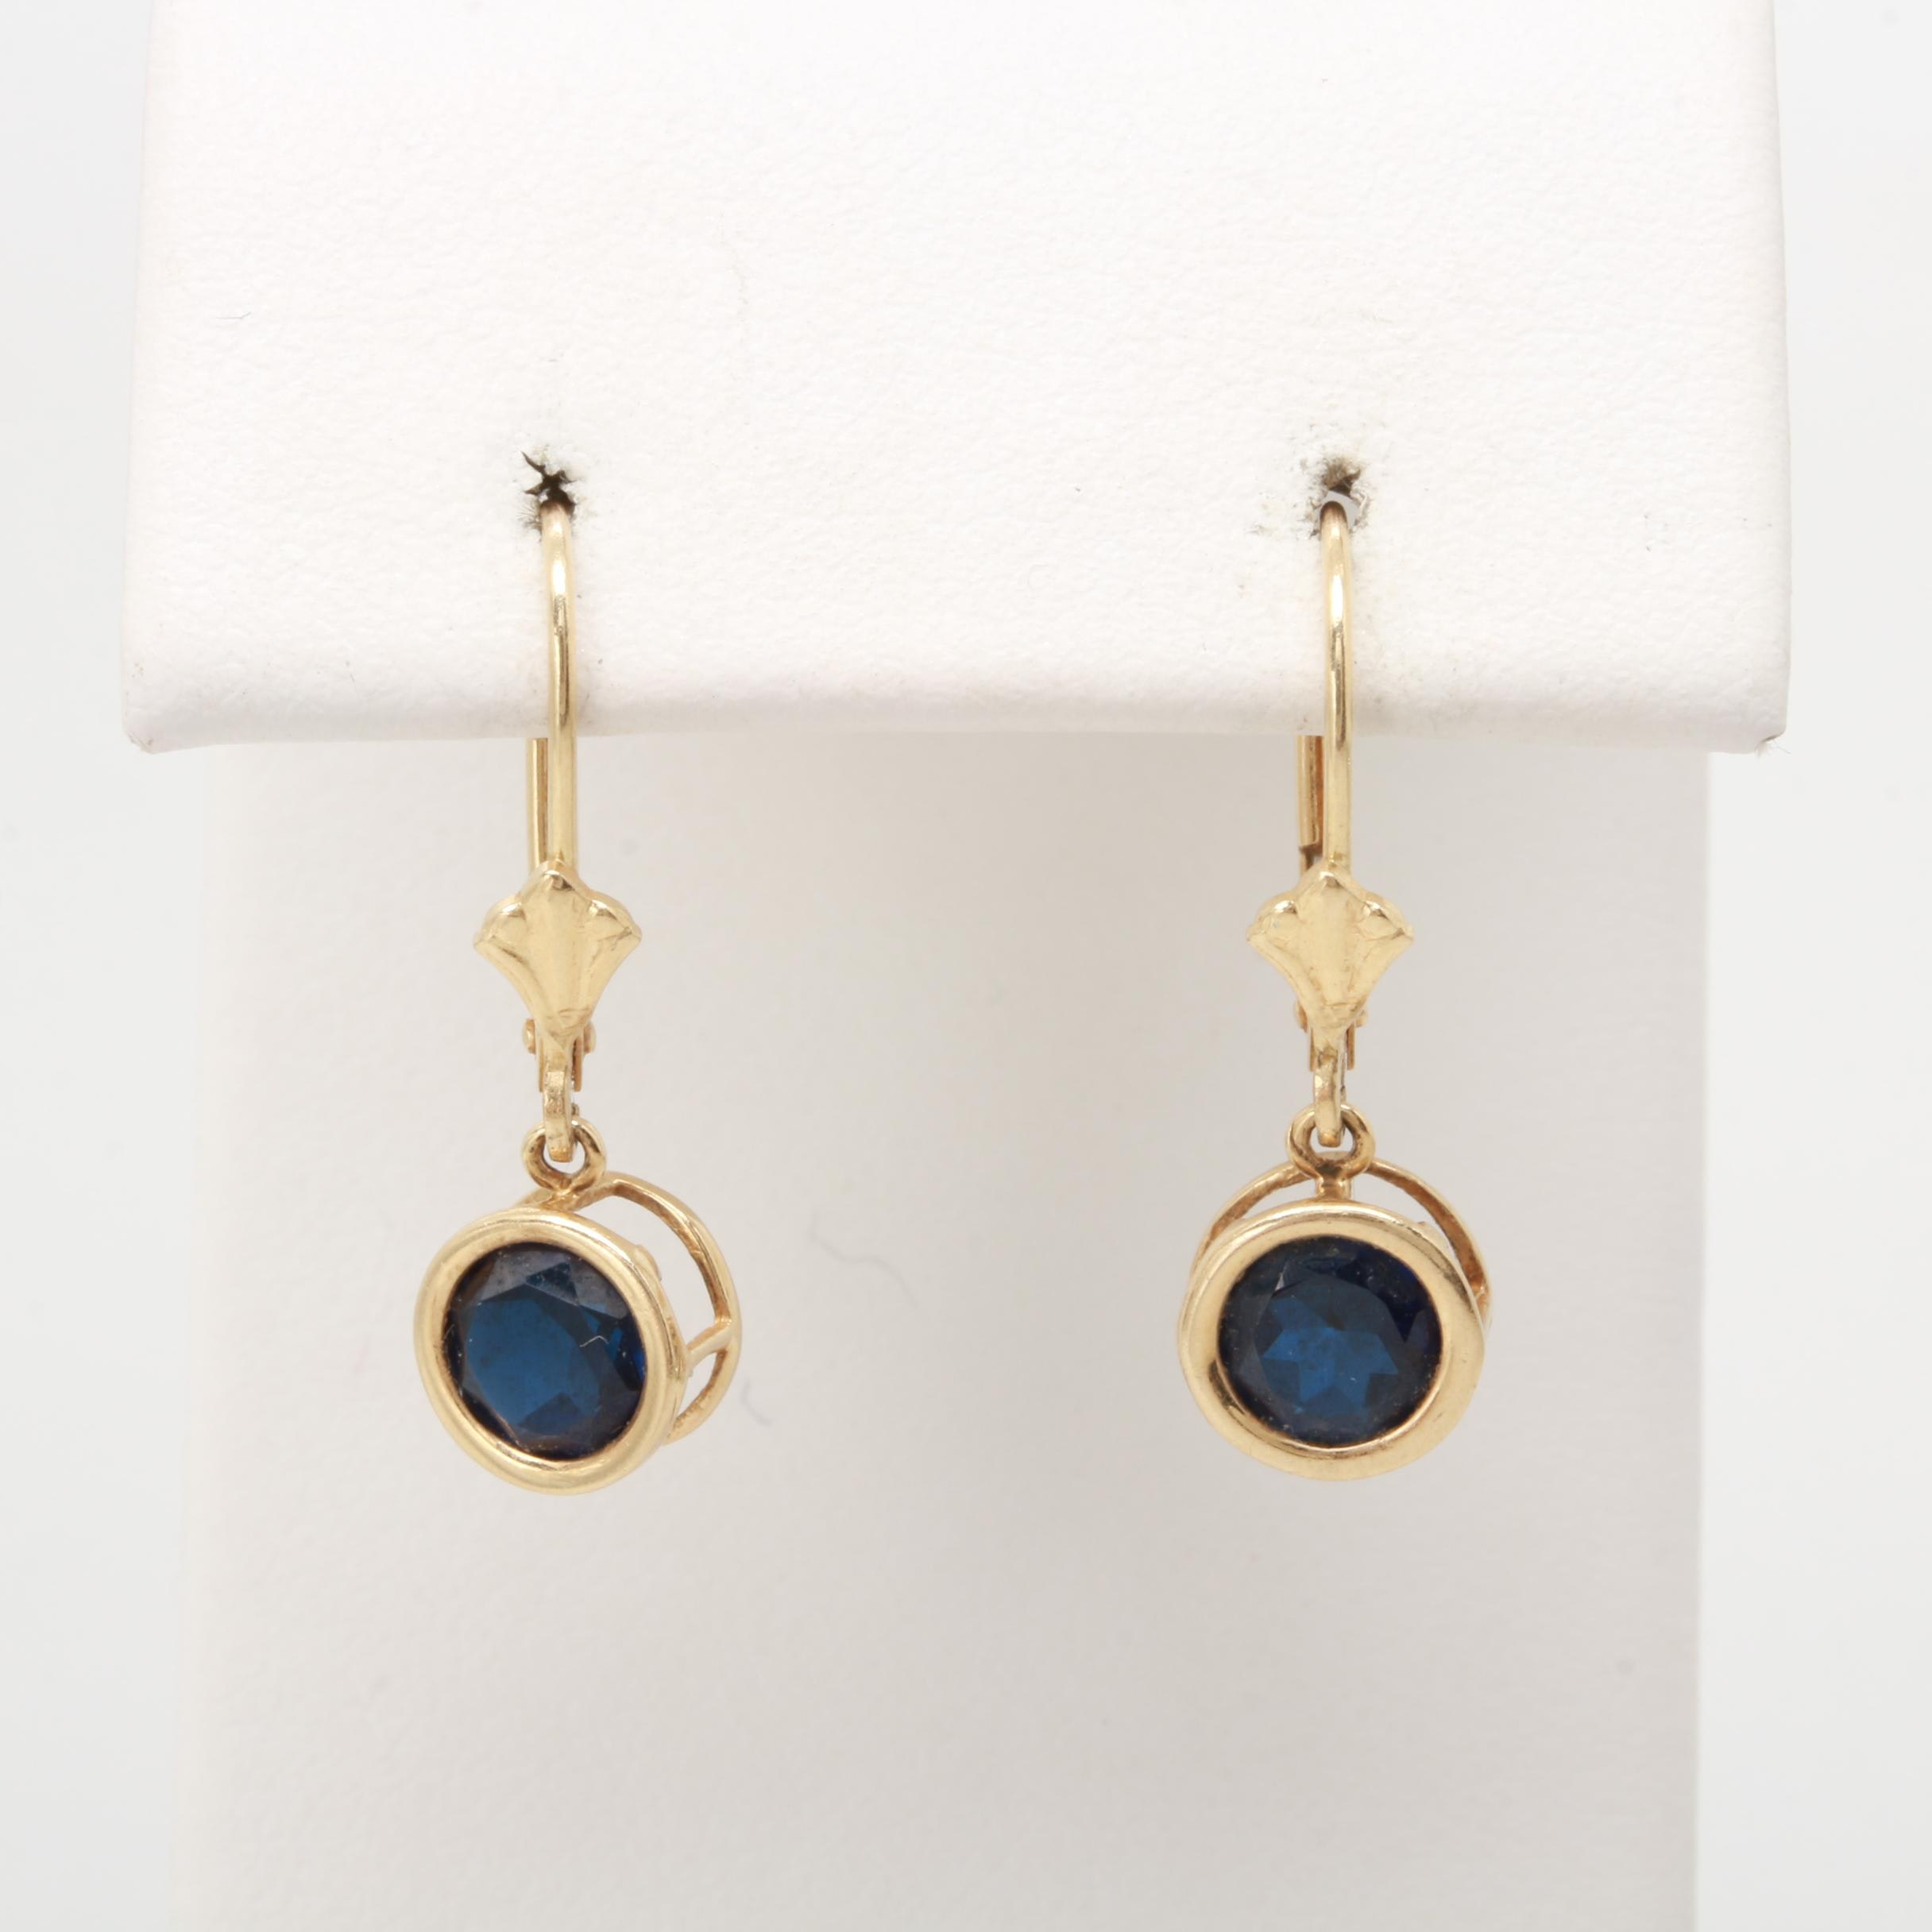 14K Yellow Gold Blue Sapphire Dangle Earrings